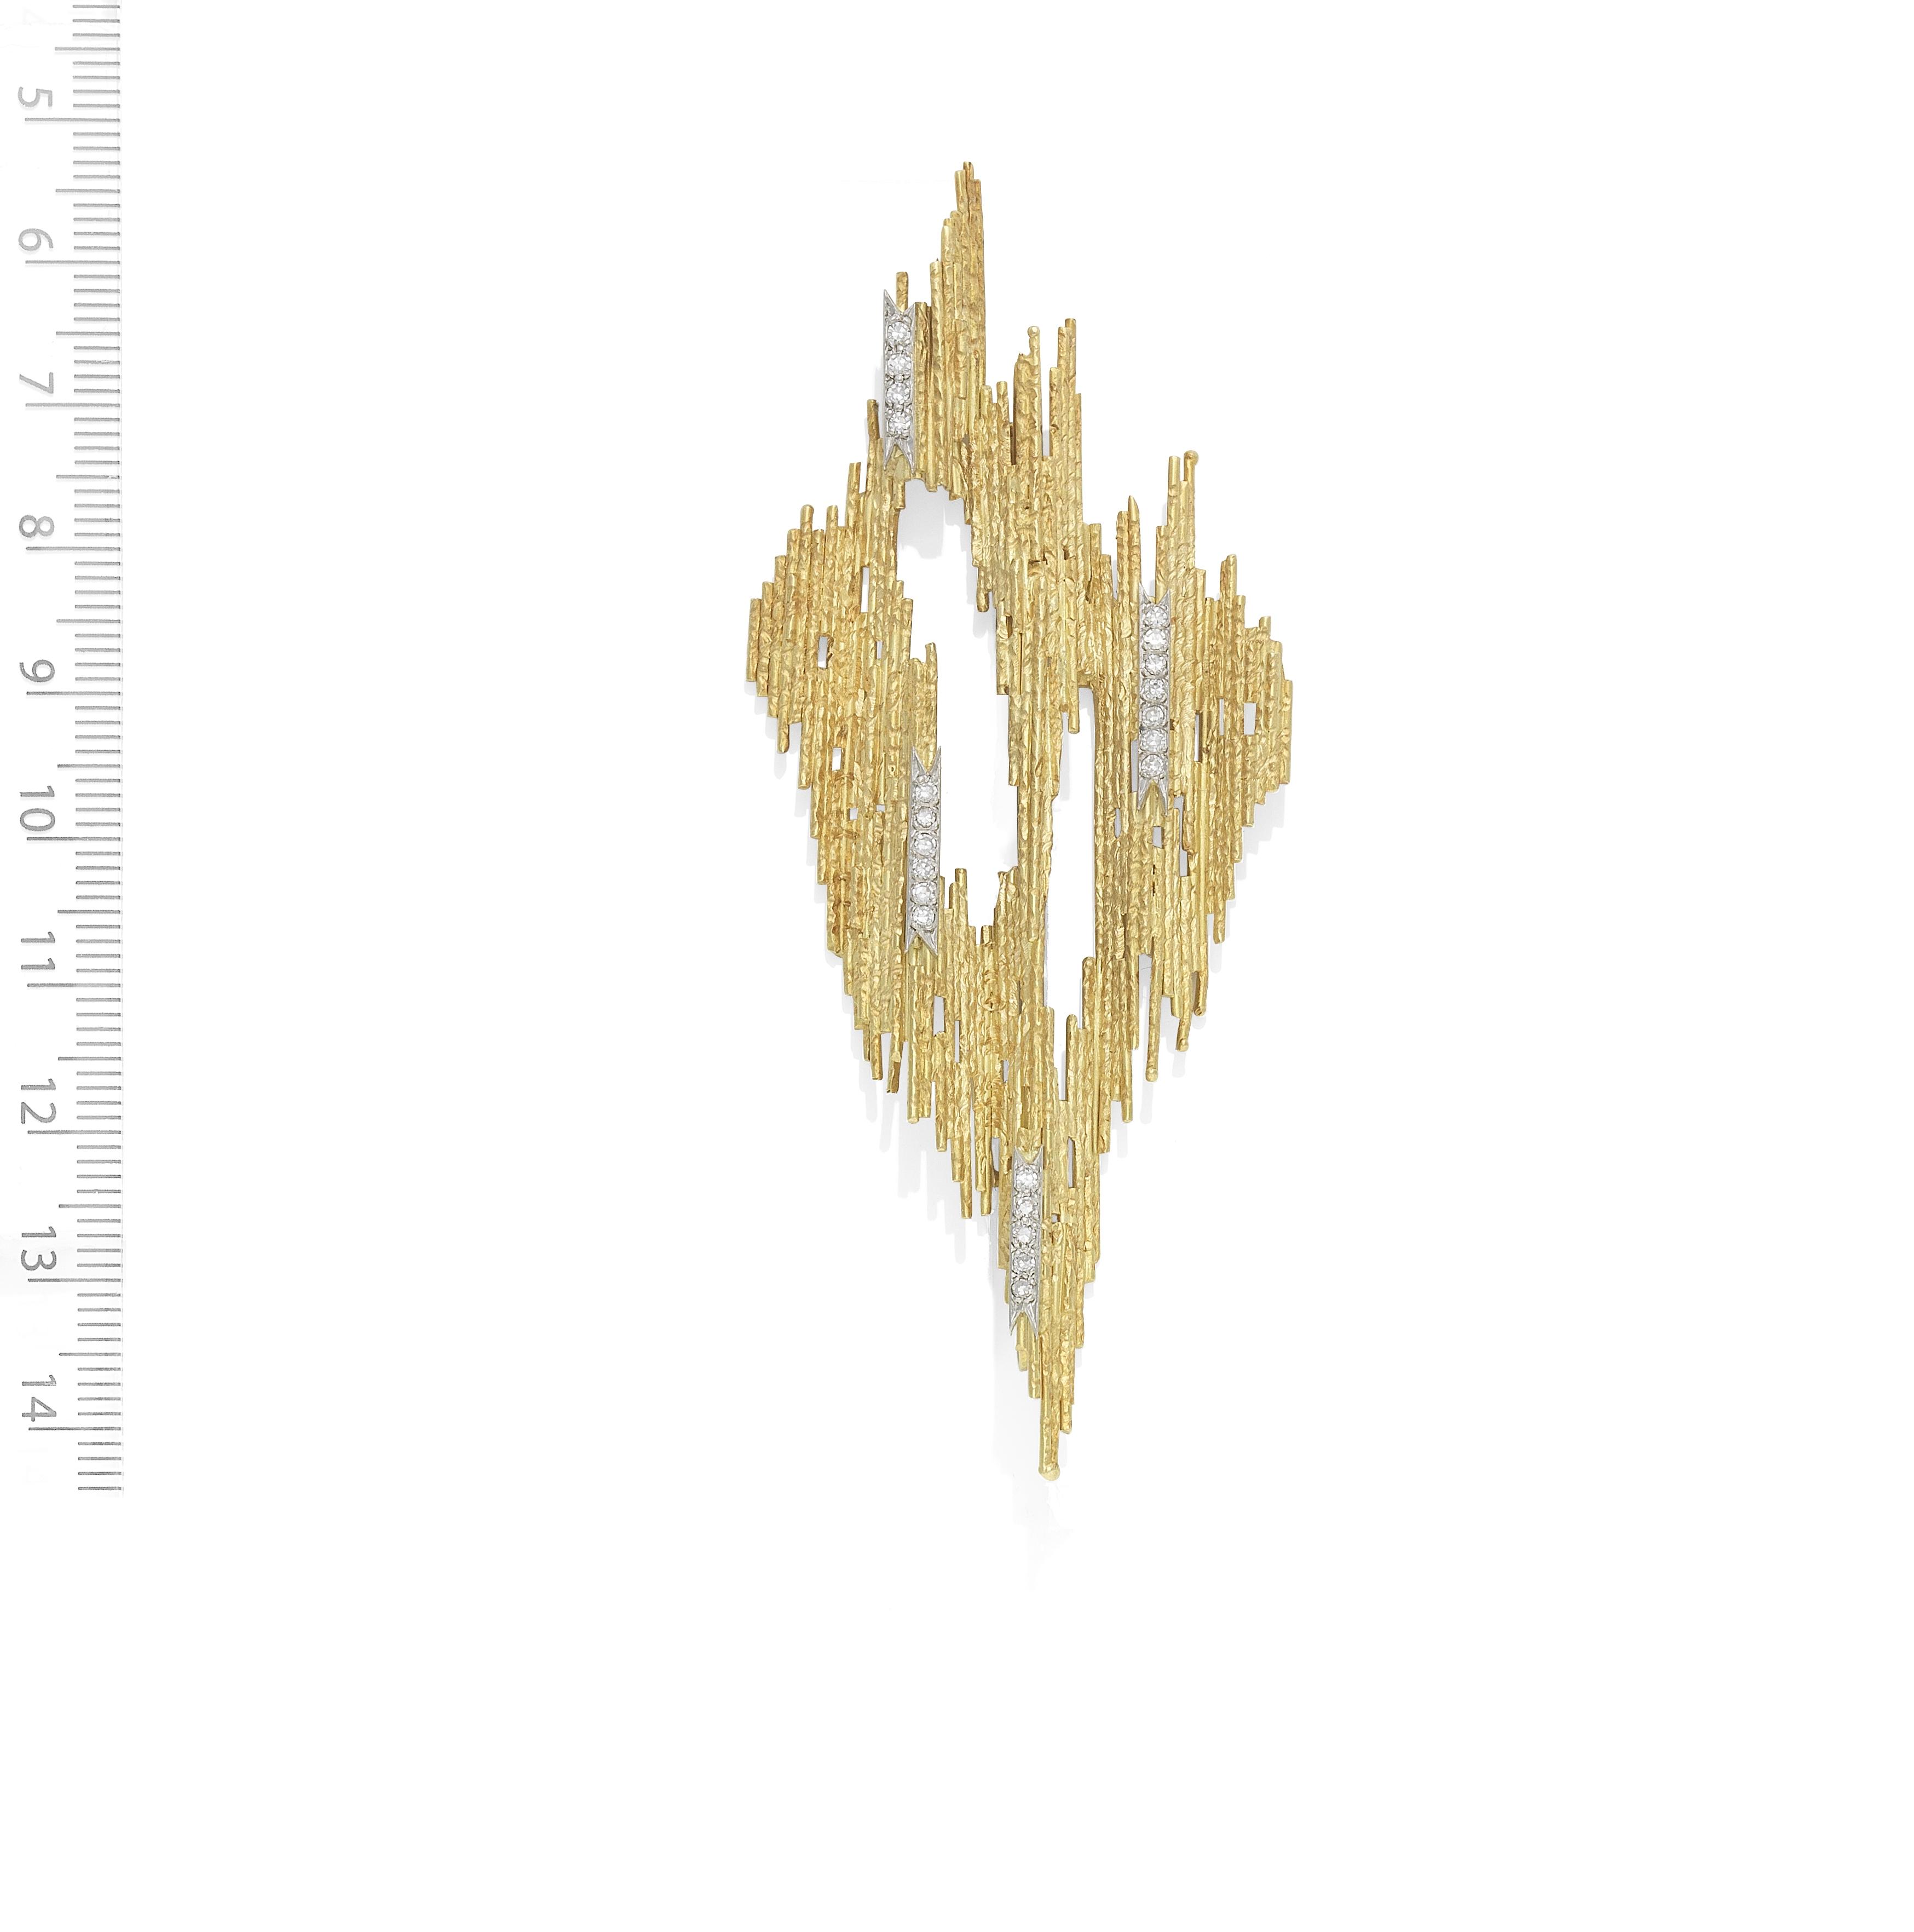 GRIMA: GOLD AND DIAMOND-SET BROOCH/PENDANT, 1974